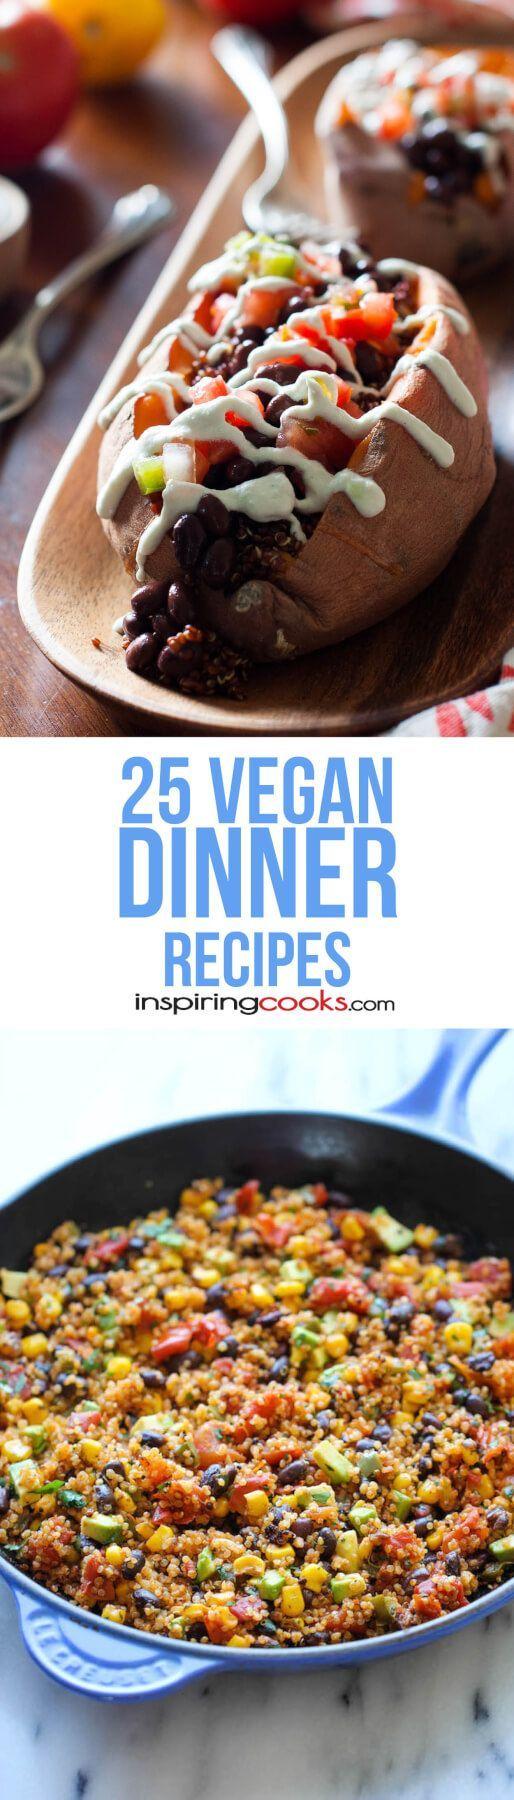 The 25 Best Vegan Dinner Main Dish Recipes